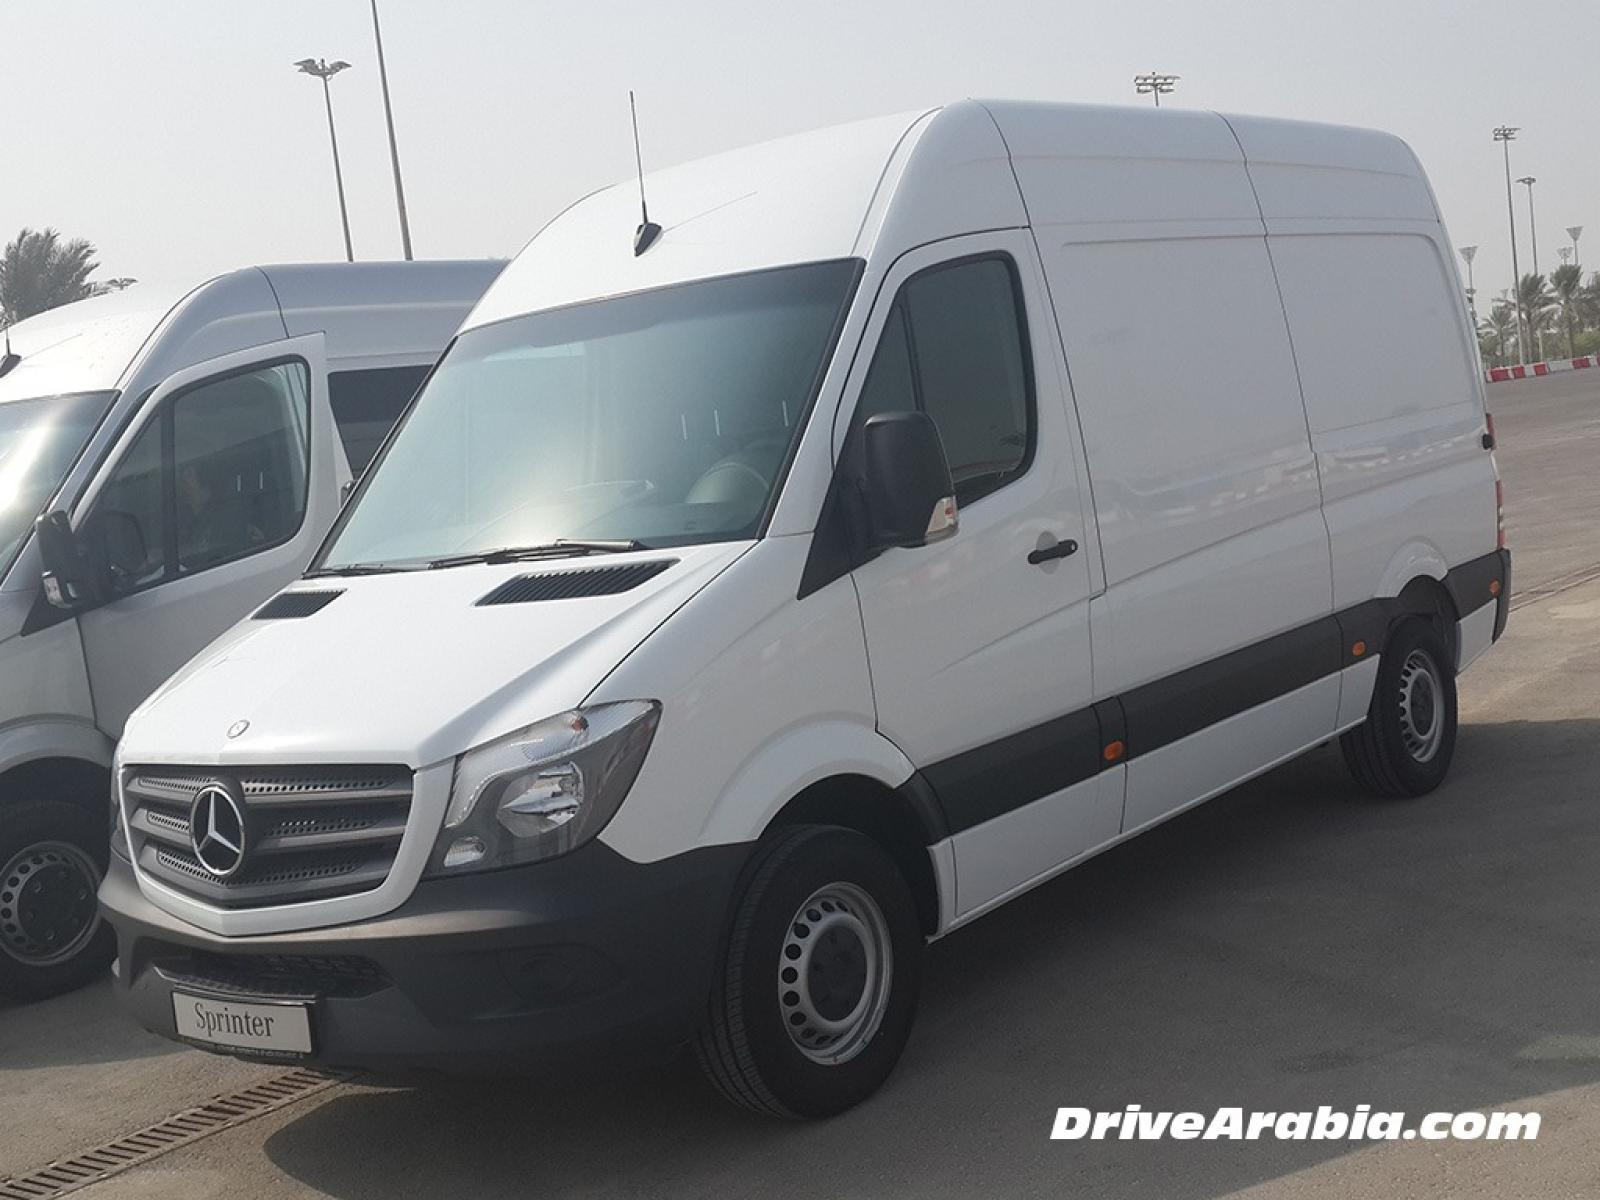 800 1024 1280 1600 origin 2014 Mercedes-Benz Sprinter